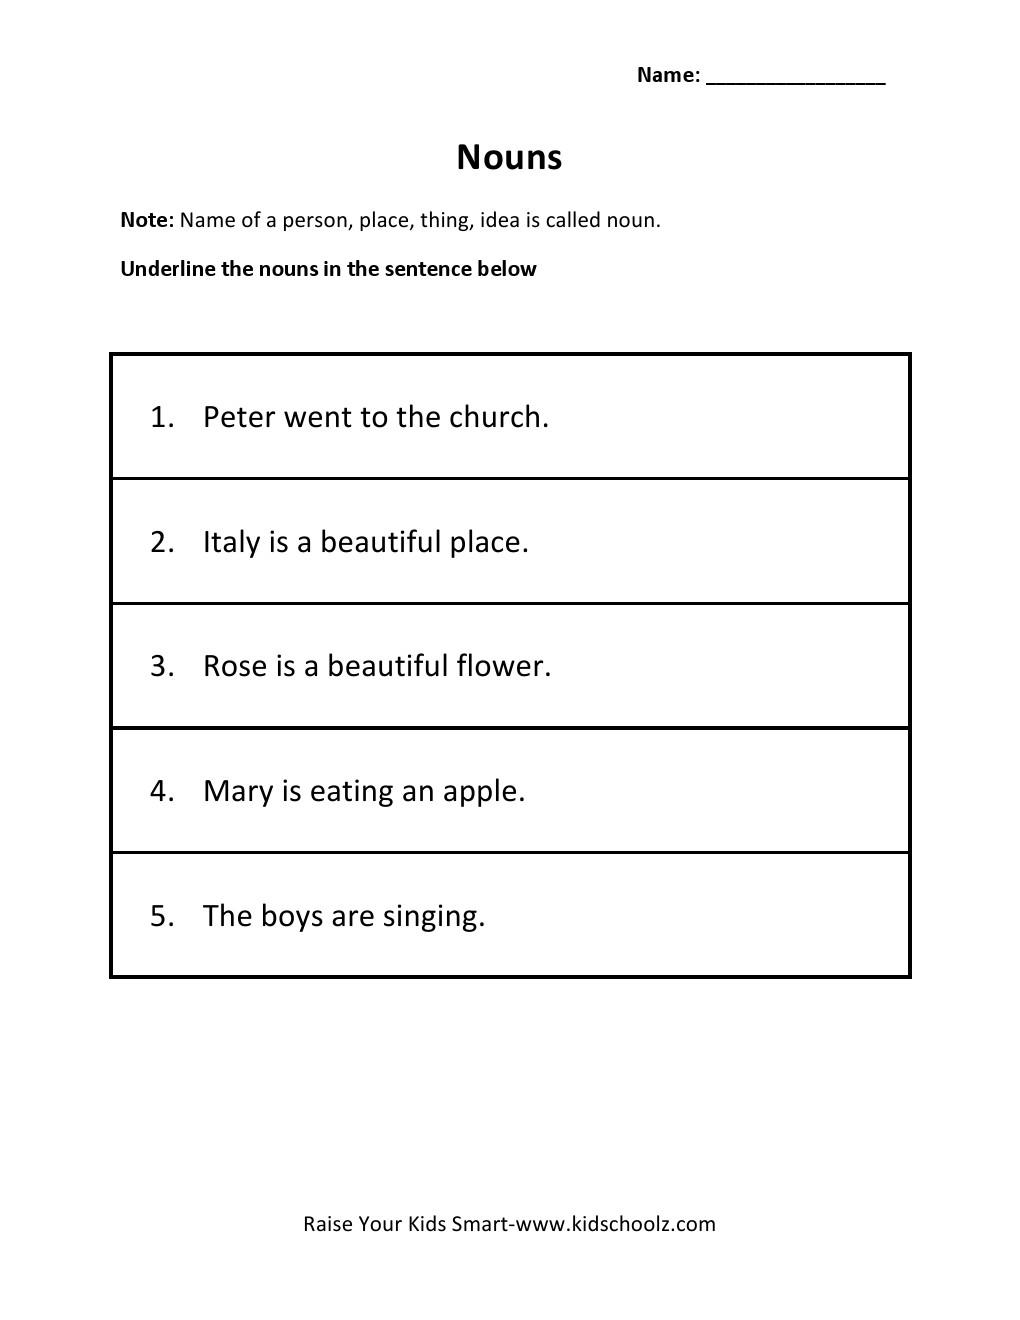 Workbooks noun practice worksheets : Underline Nouns Worksheet For Grade 1: Falling into first ...